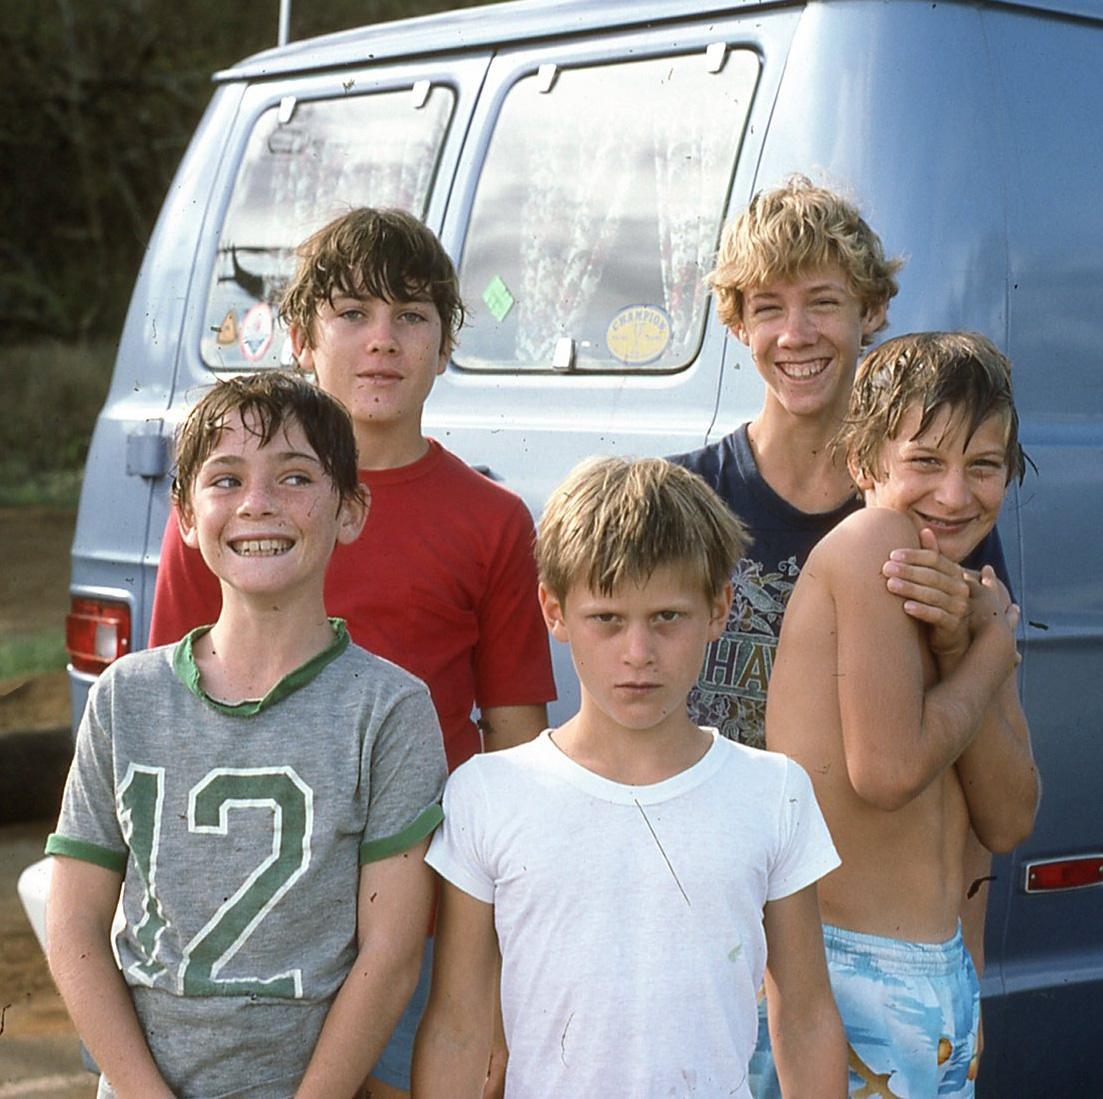 Chris Ruddy (center) and friends Ewa Beach1976